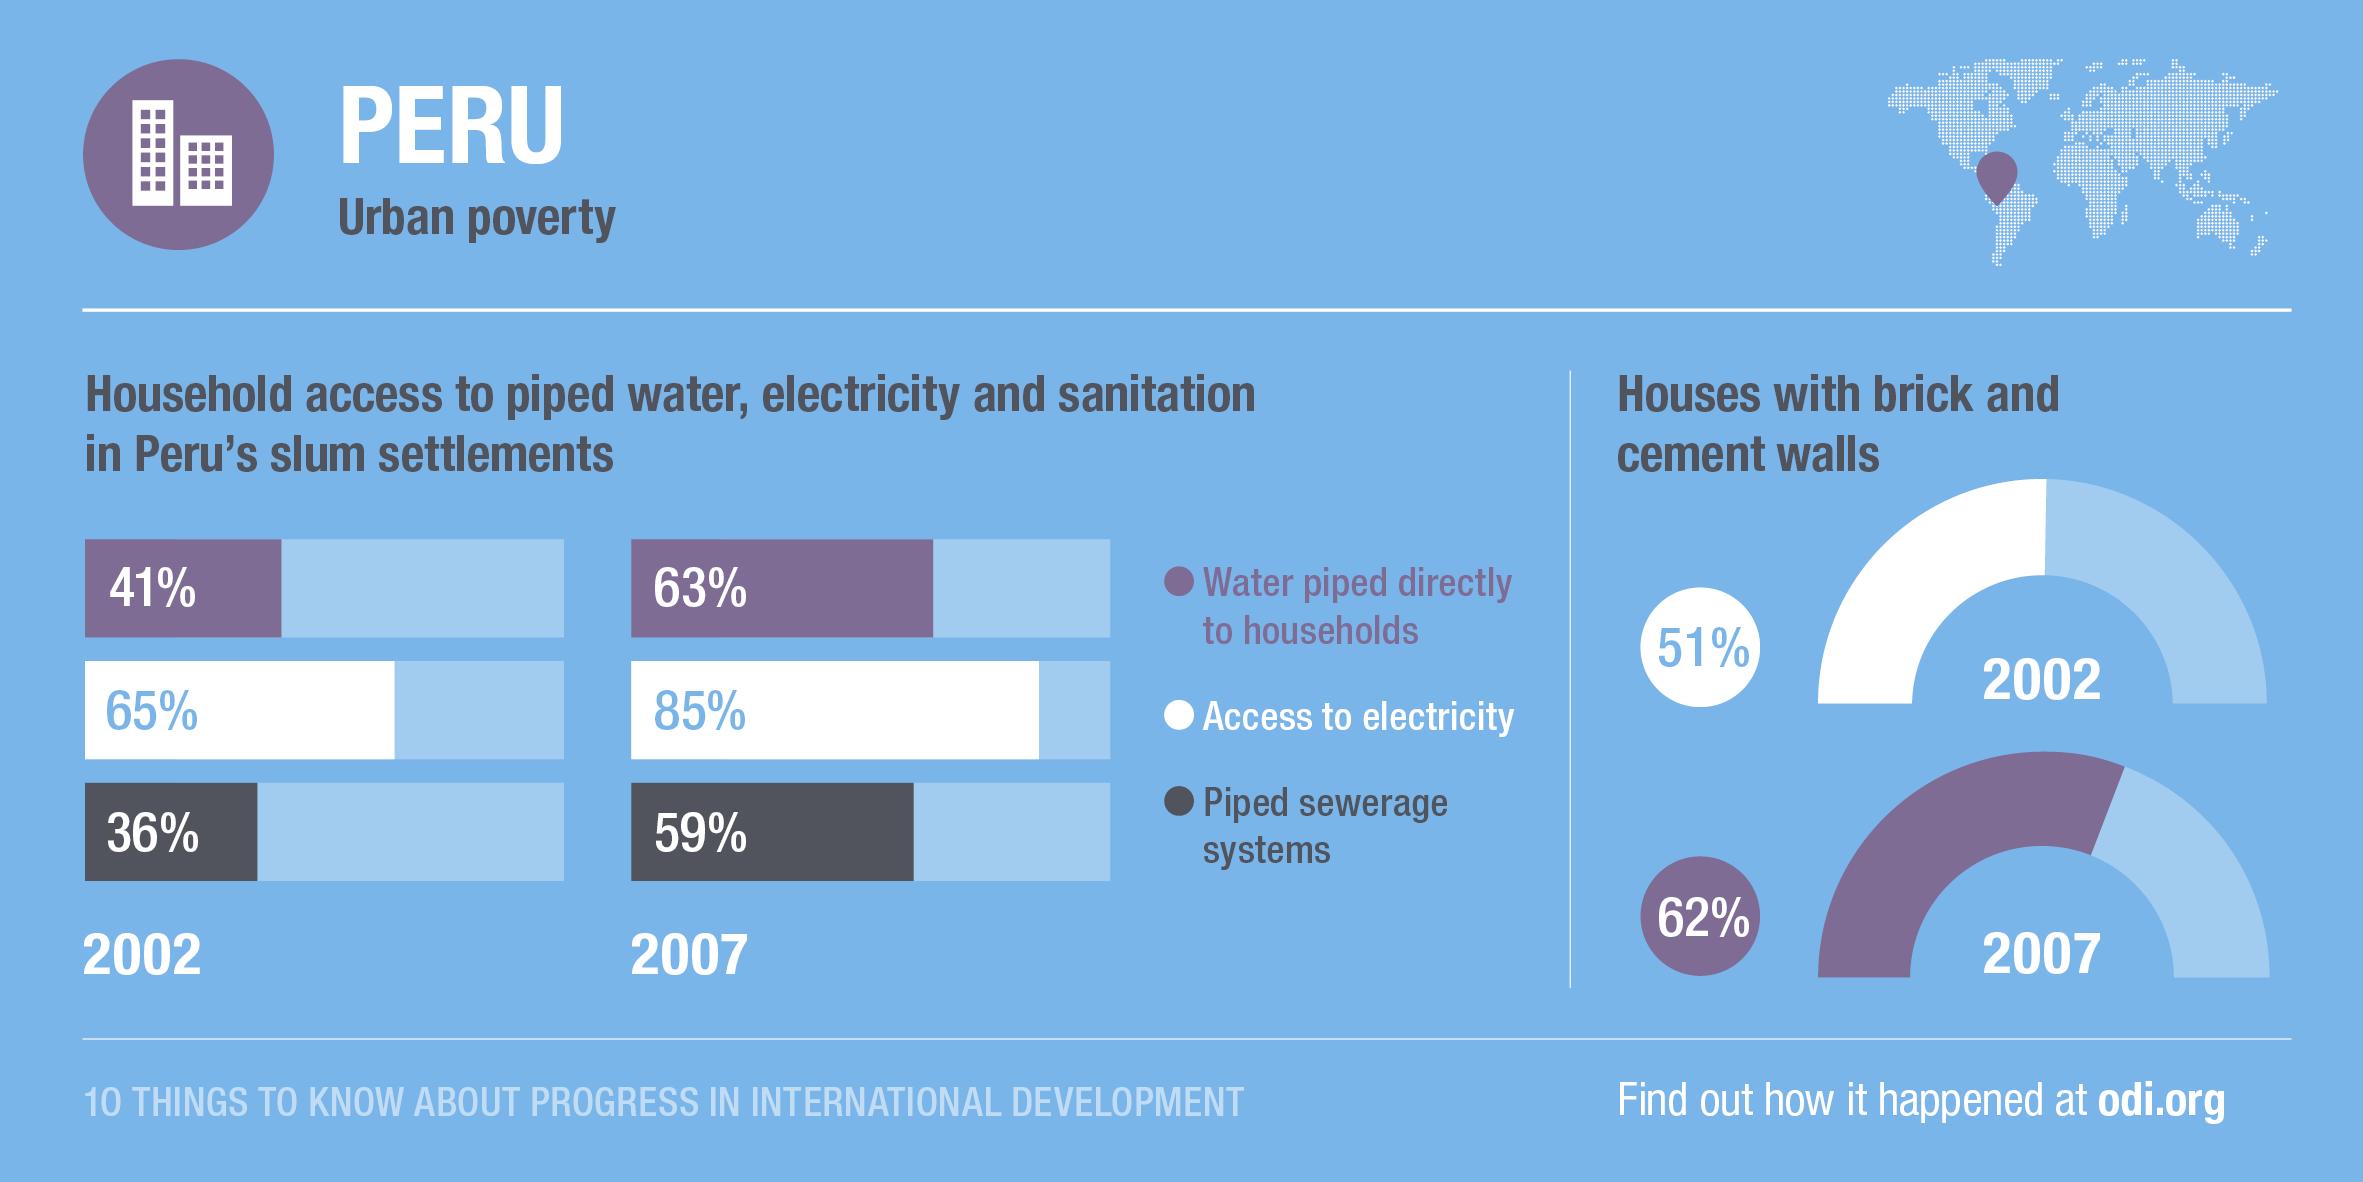 Peru's progress on slum settlements